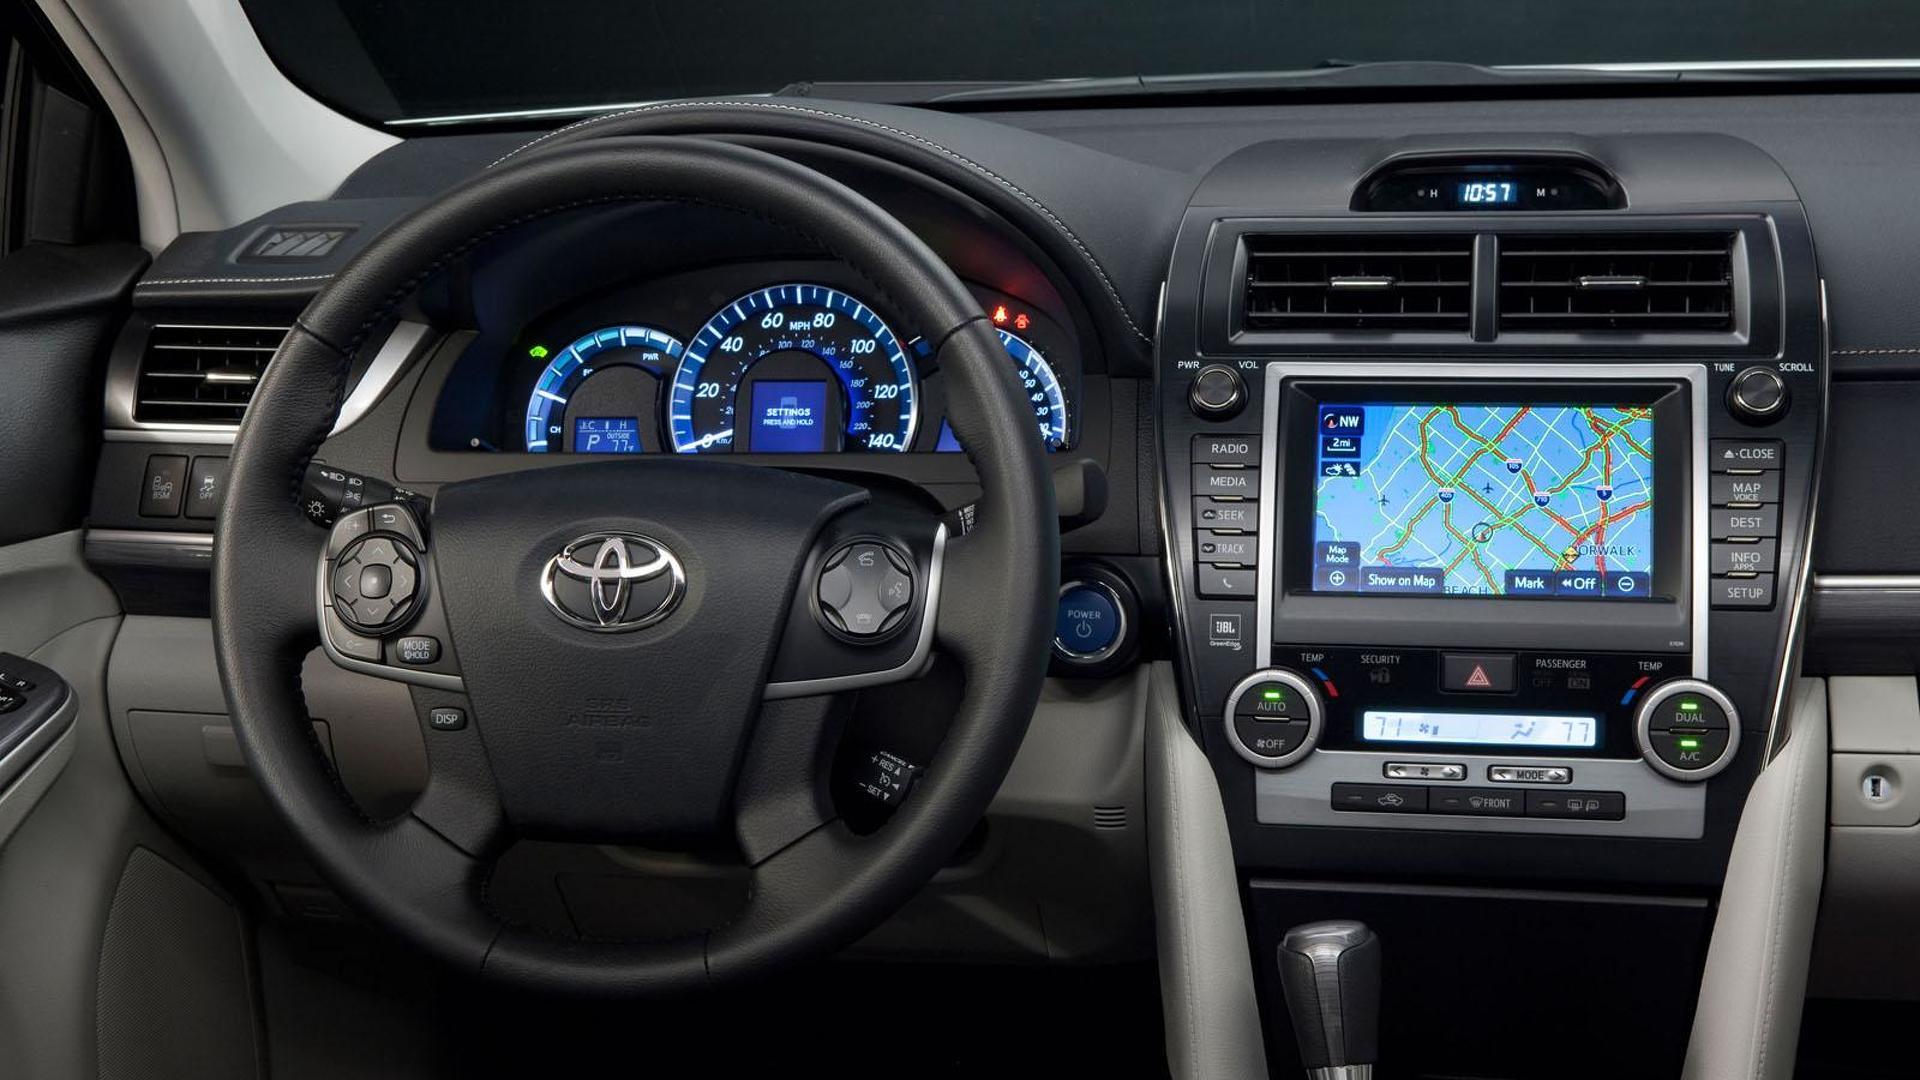 2013 Toyota Camry gains upgraded interior, new equipment